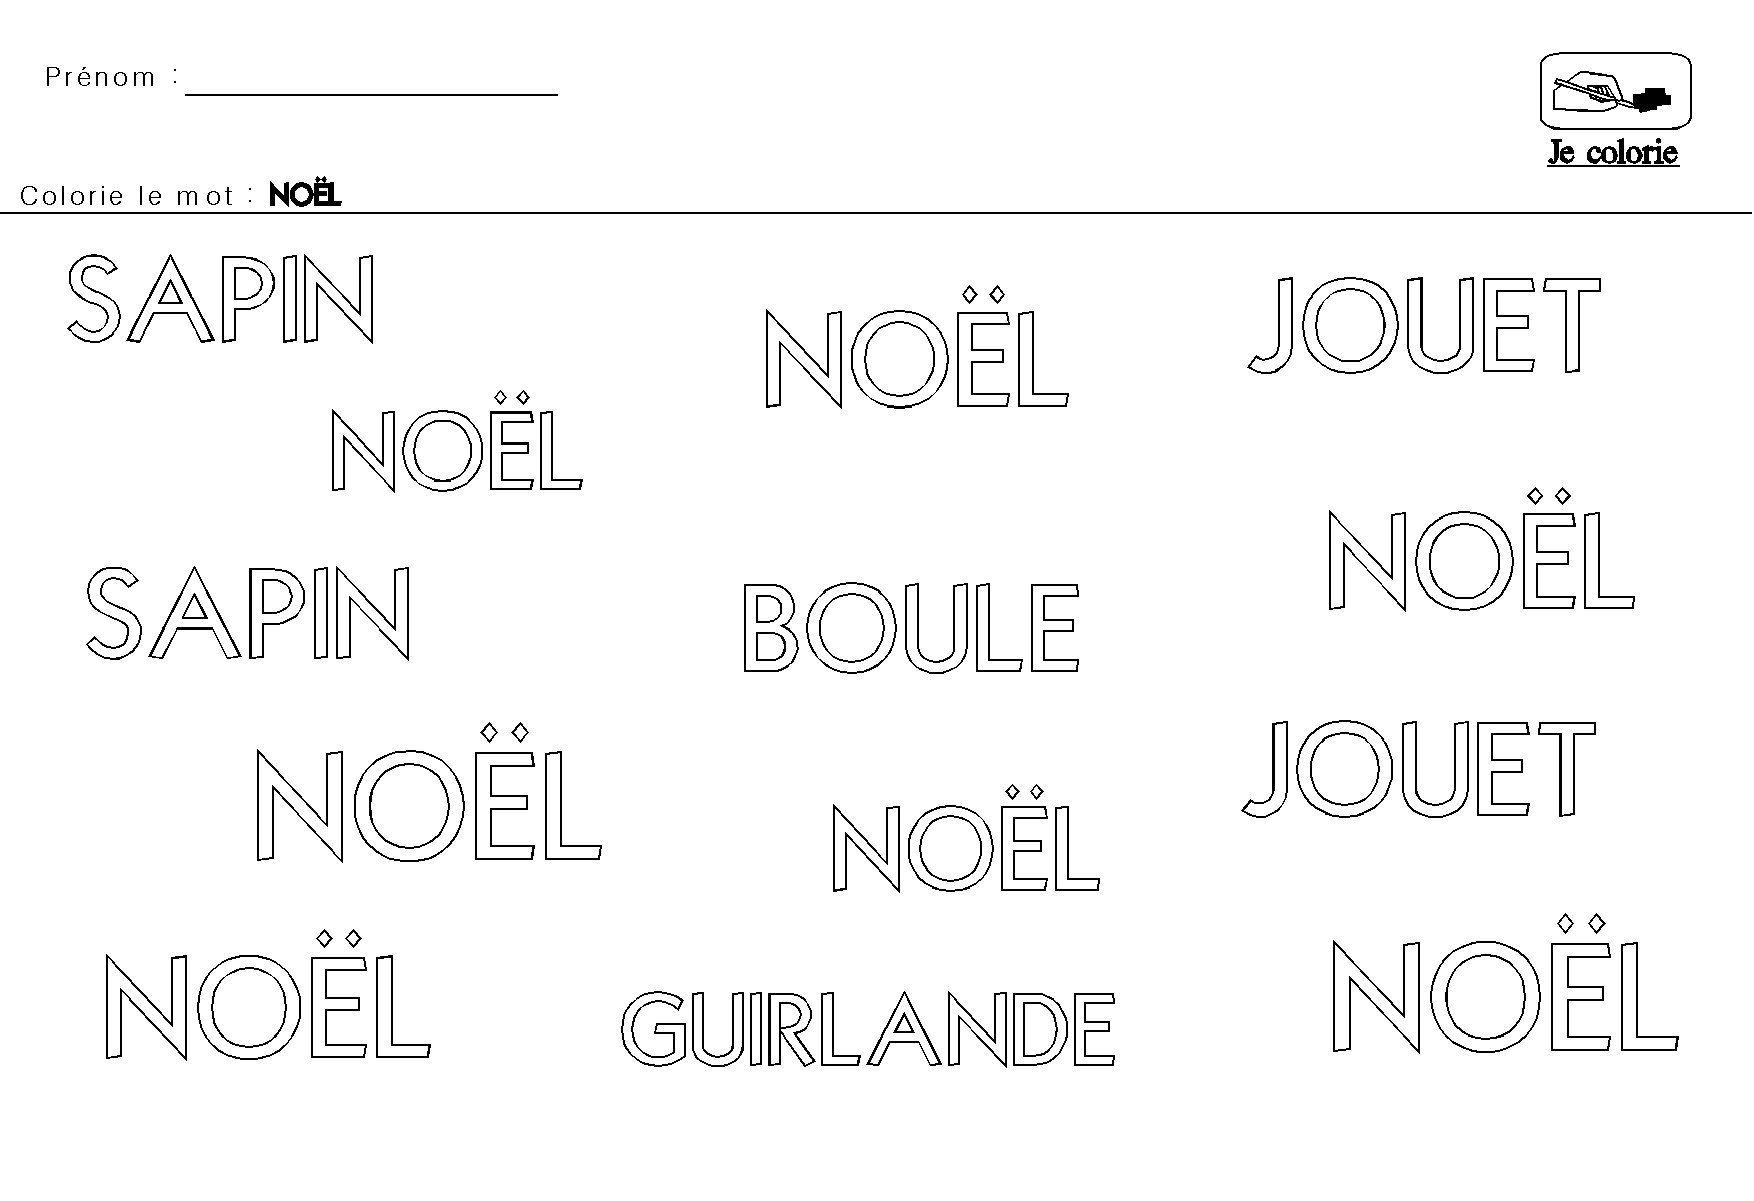 Noel En Maternelle Colorier Le Mot Noel (Avec Images) | Noel pour Noel Maternelle Grande Section